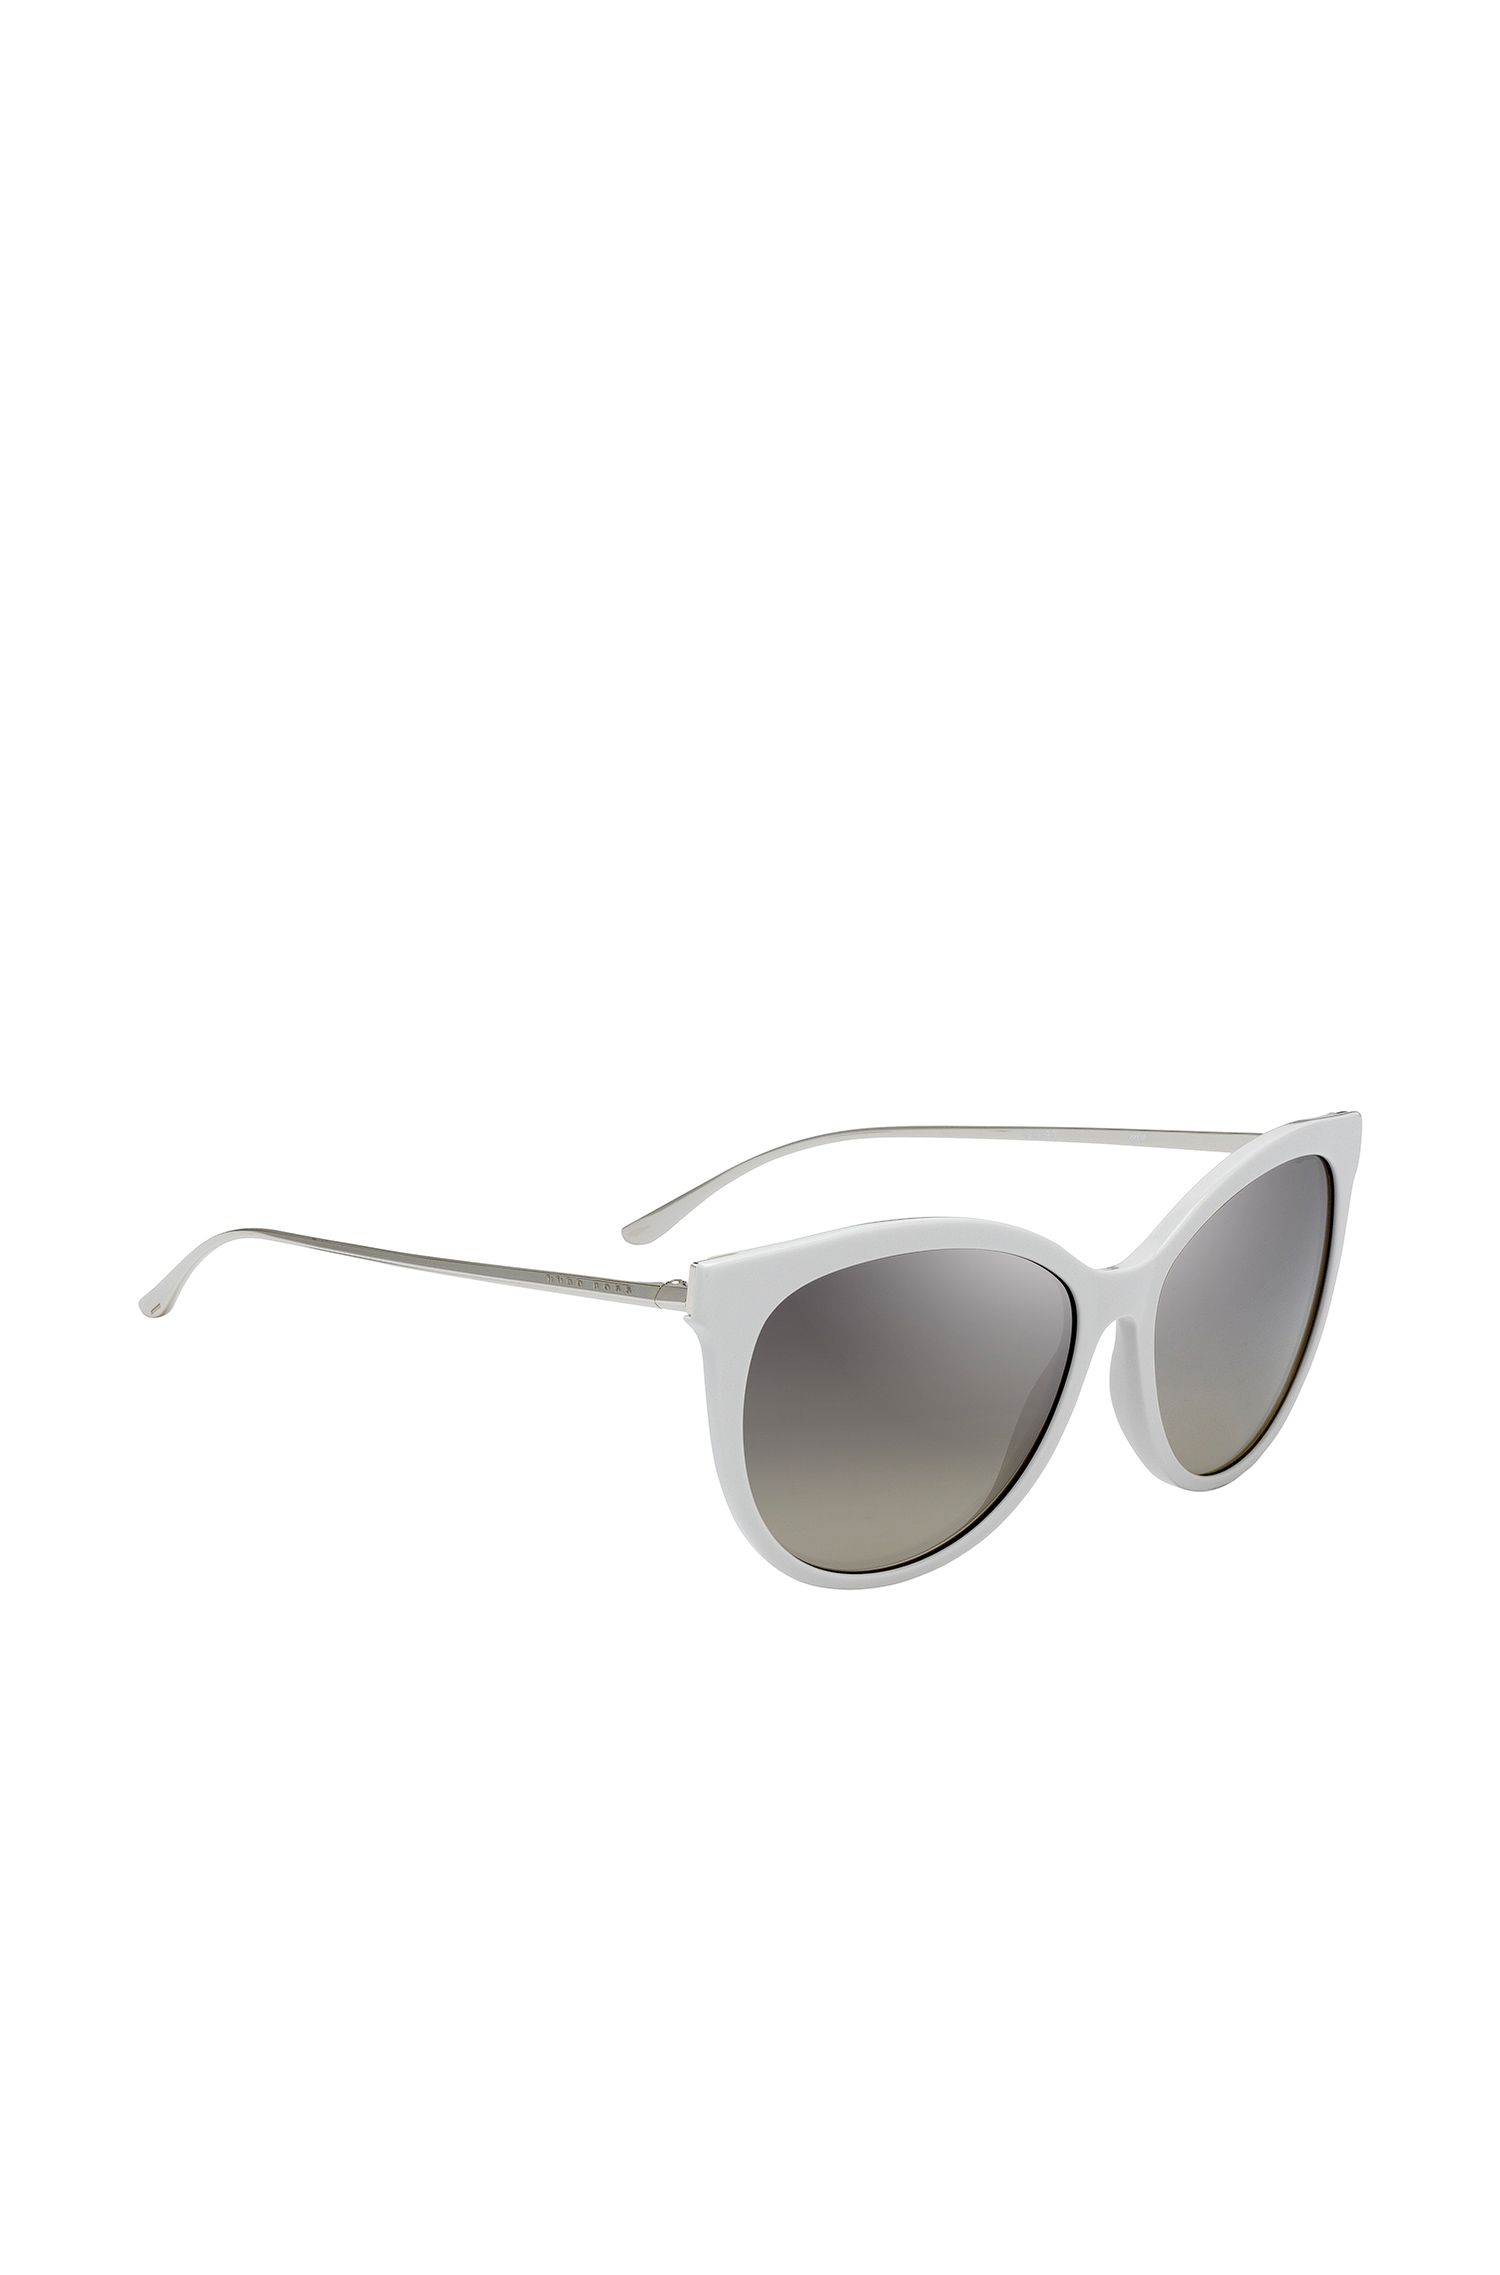 'BOSS 0892S' | White Cat-Eye Sunglasses